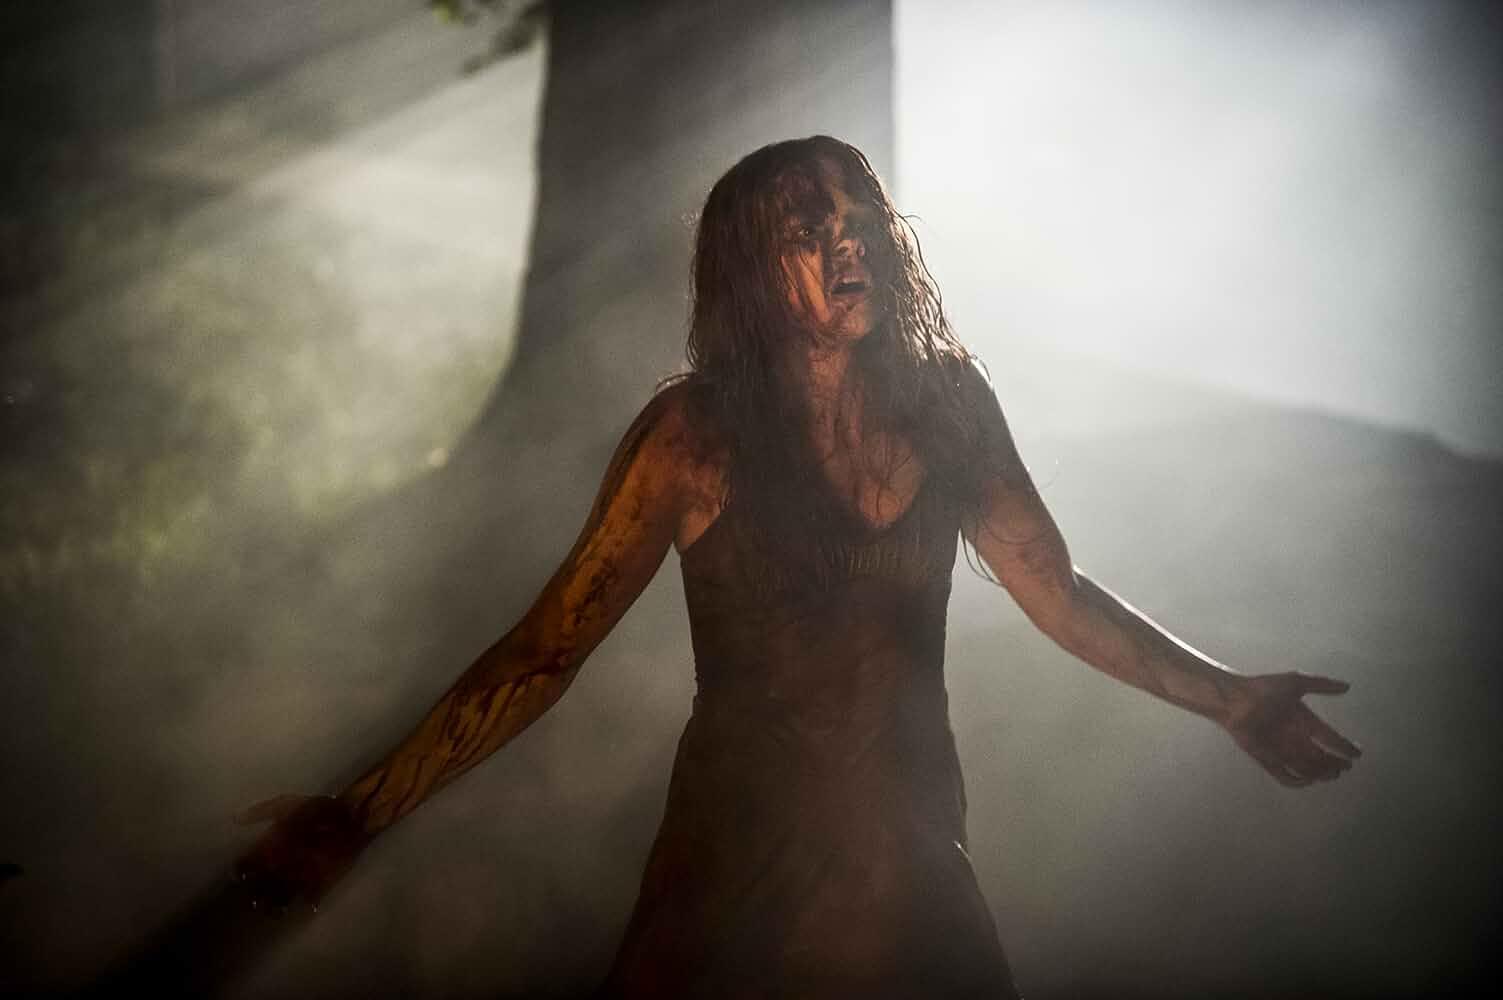 Chloë Grace Moretz in Carrie (2013)